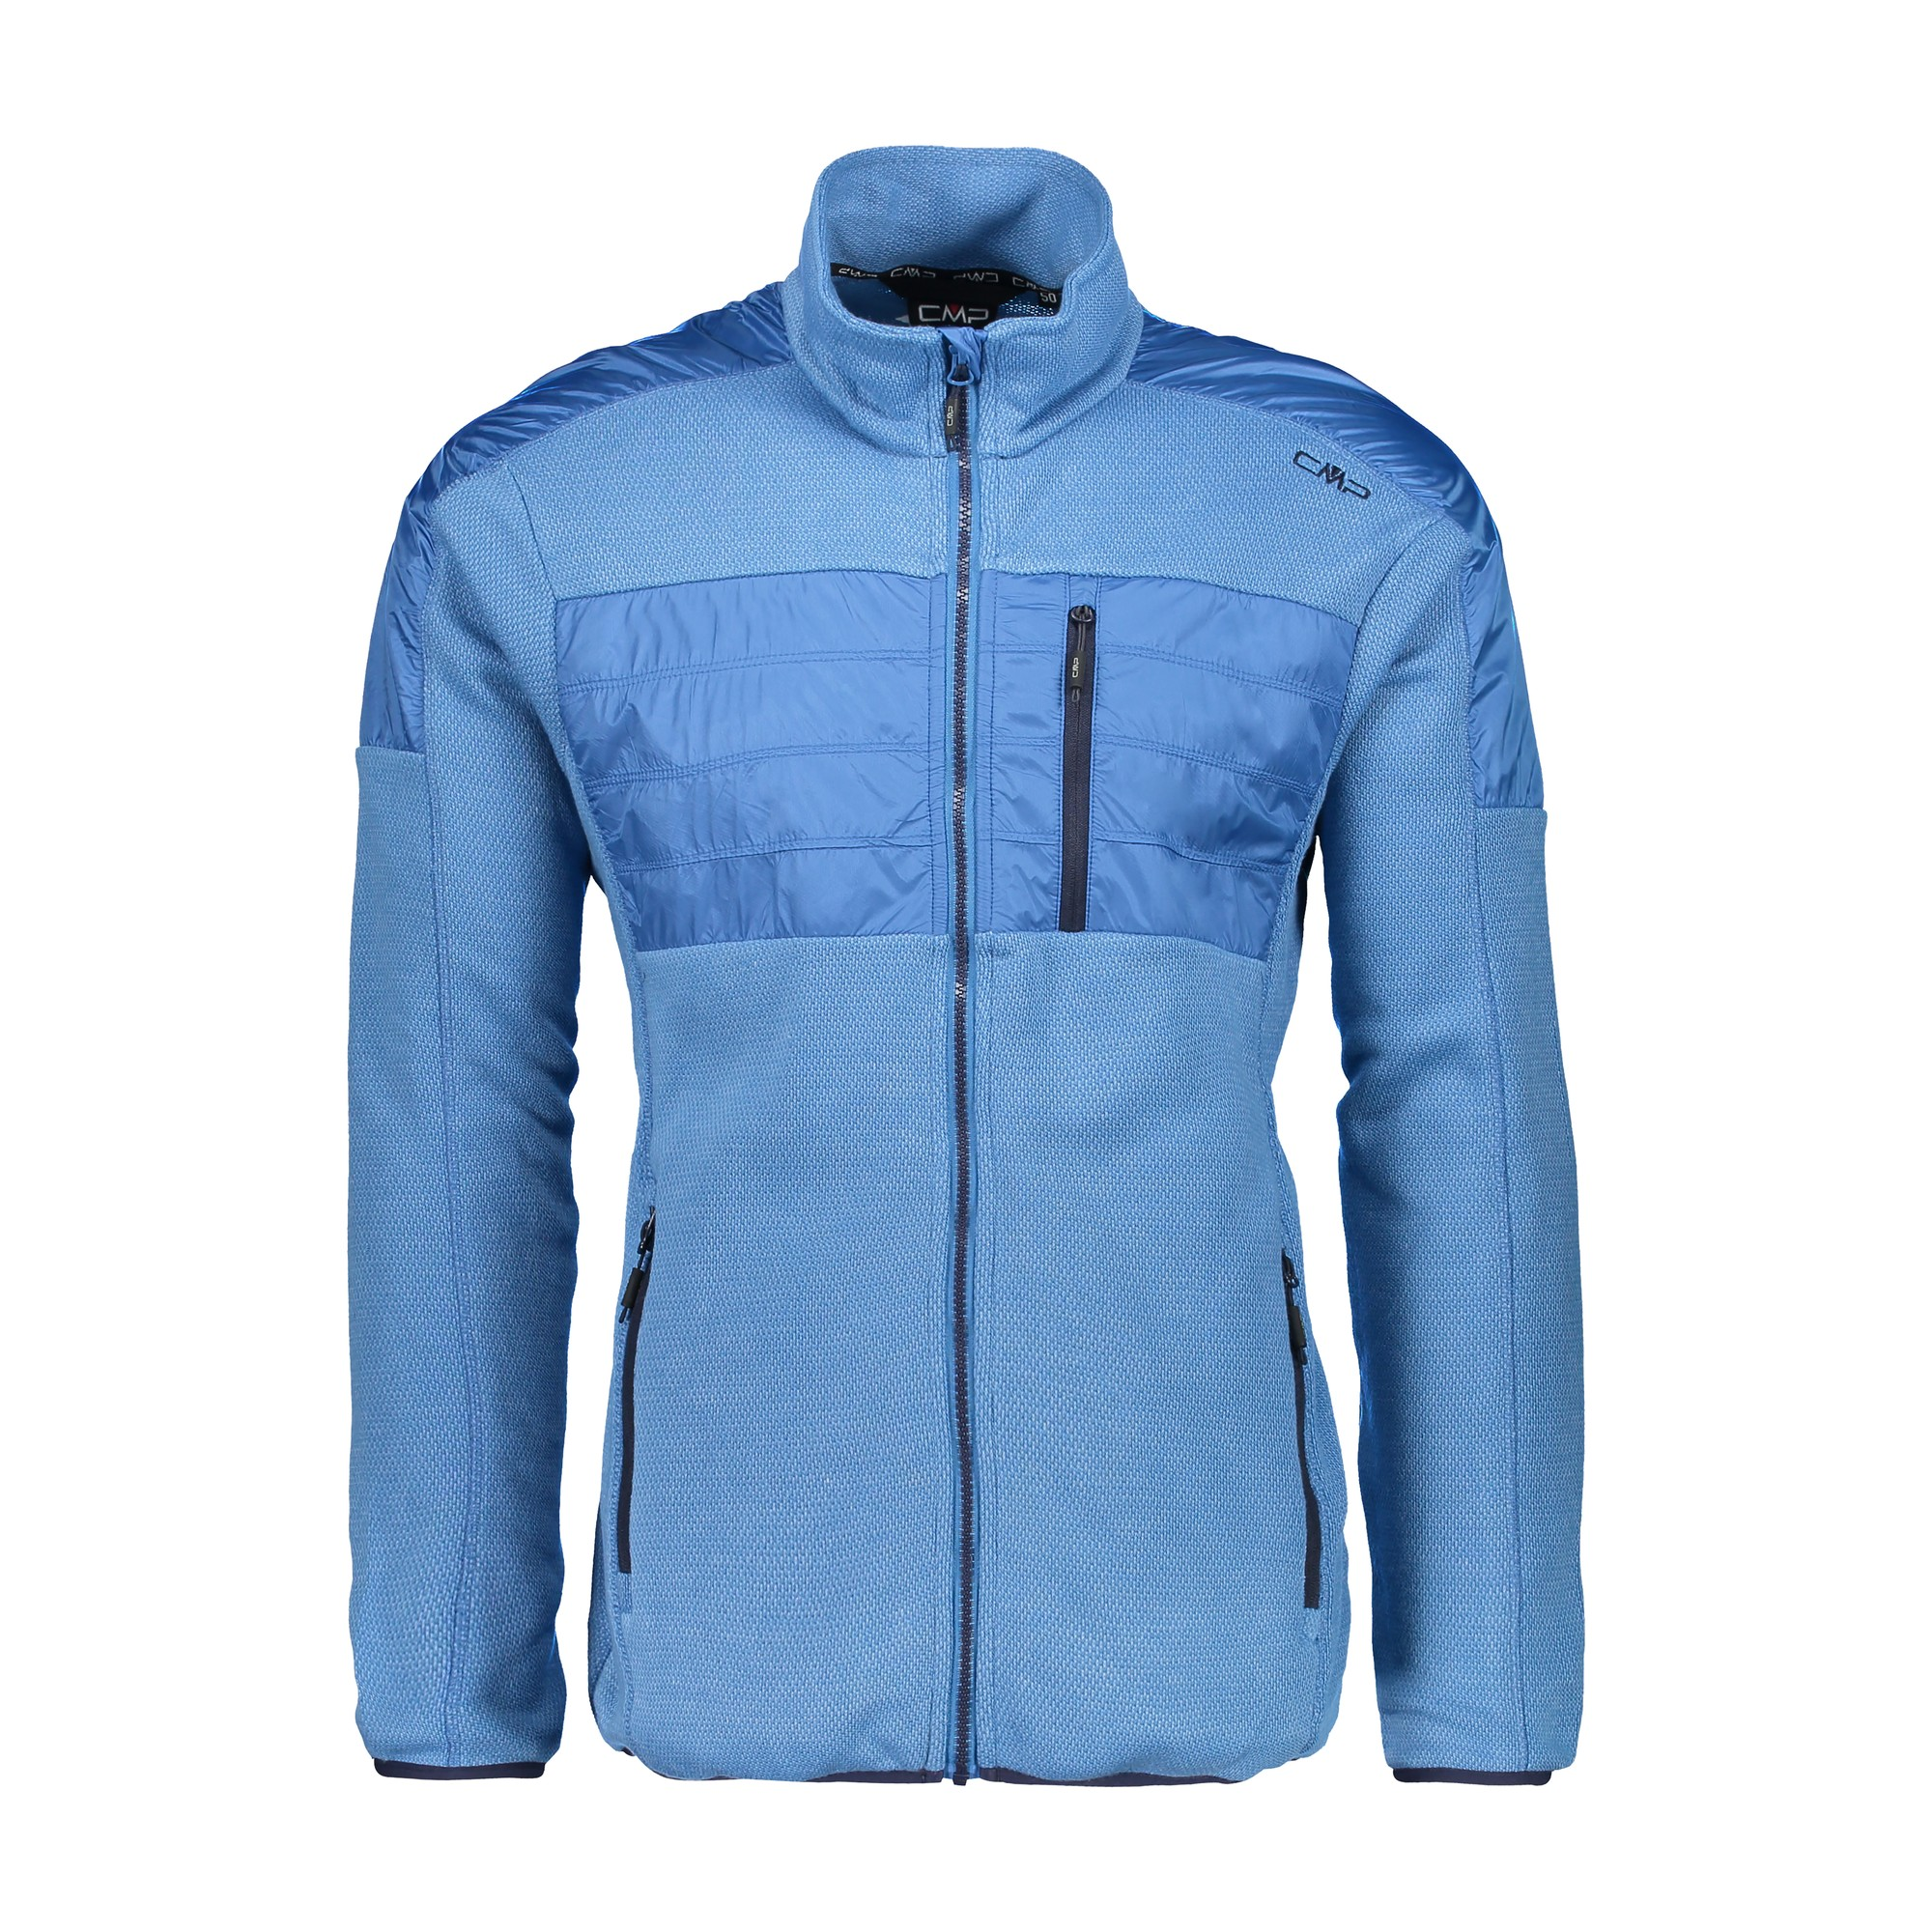 CMP Fleecejacke Jacke MAN JACKET blau atmungsaktiv elastisch wärmend Unifarben